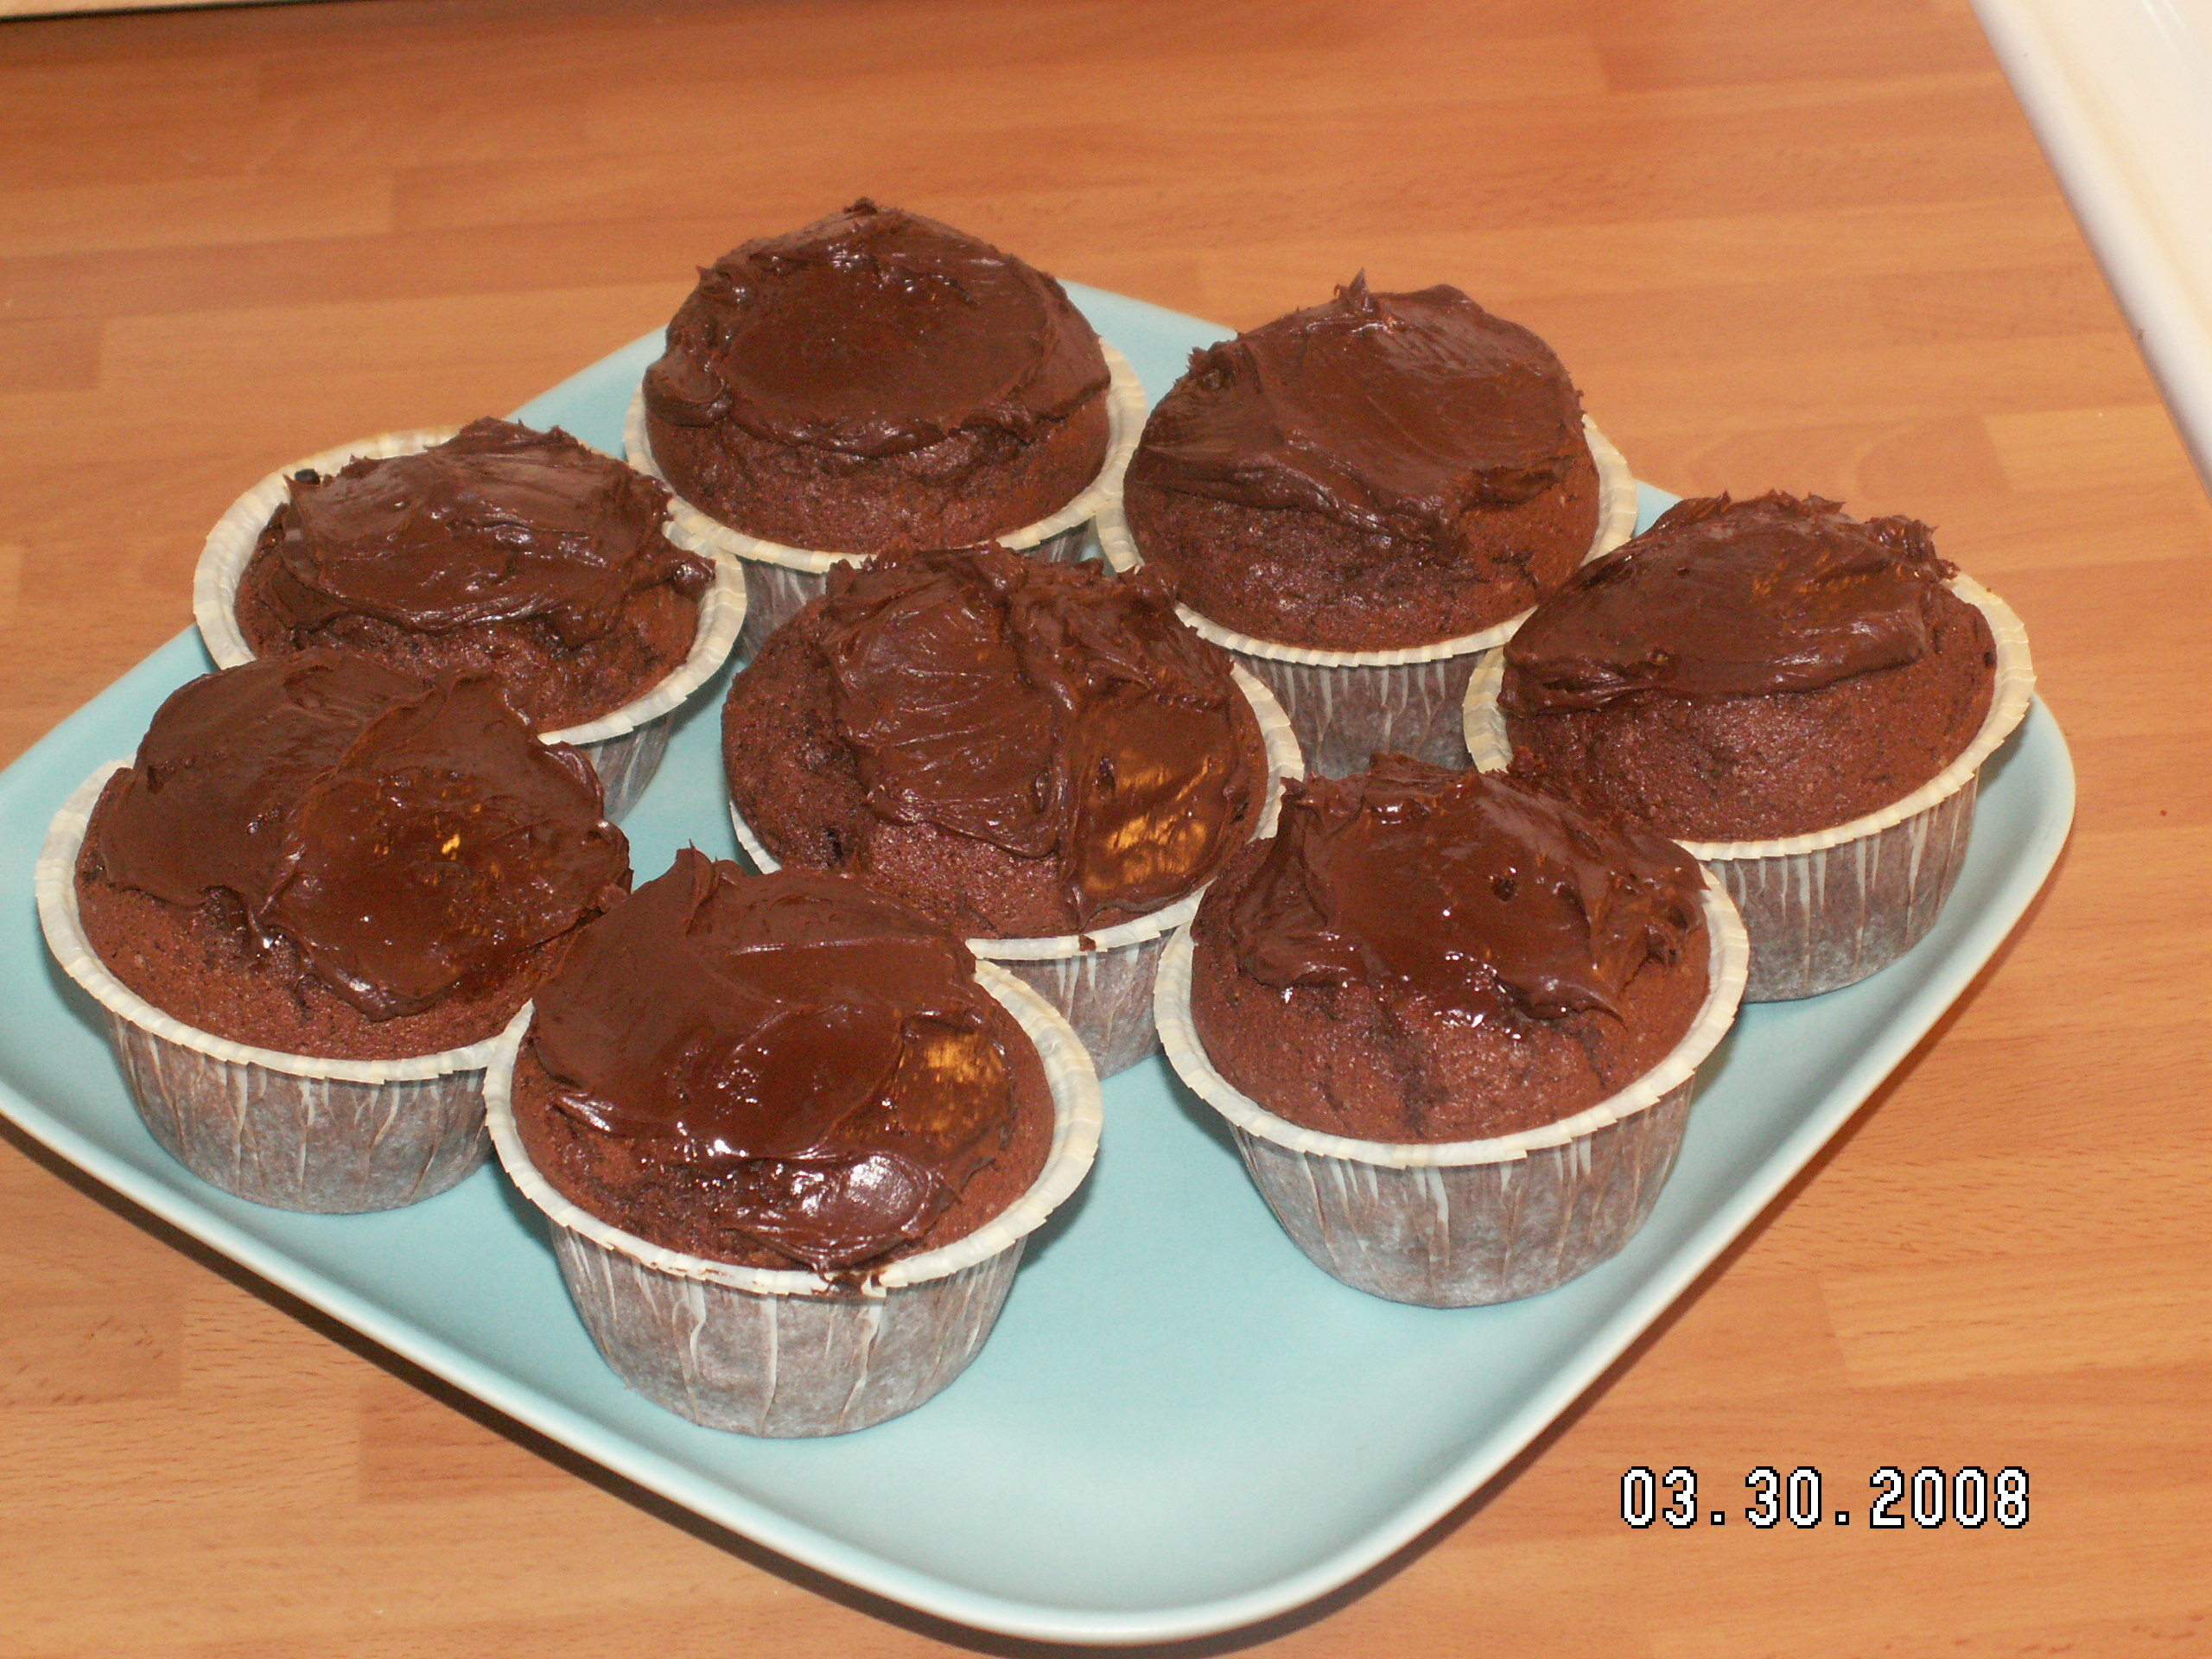 god glasyr på chokladmuffins